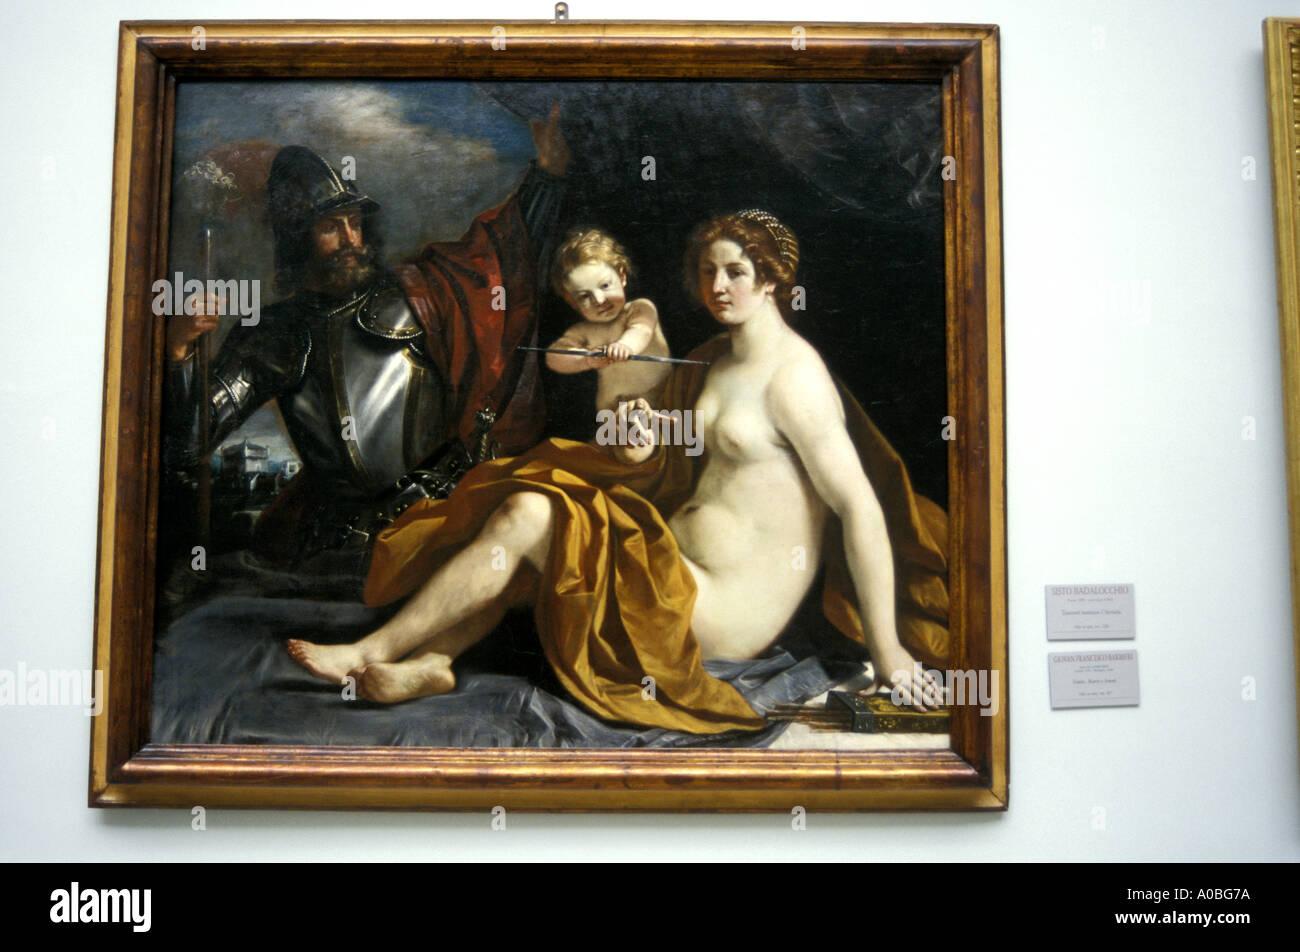 Venere Marte Amore Guercino work of art Estense gallery Modena Emilia Romagna Italy - Stock Image